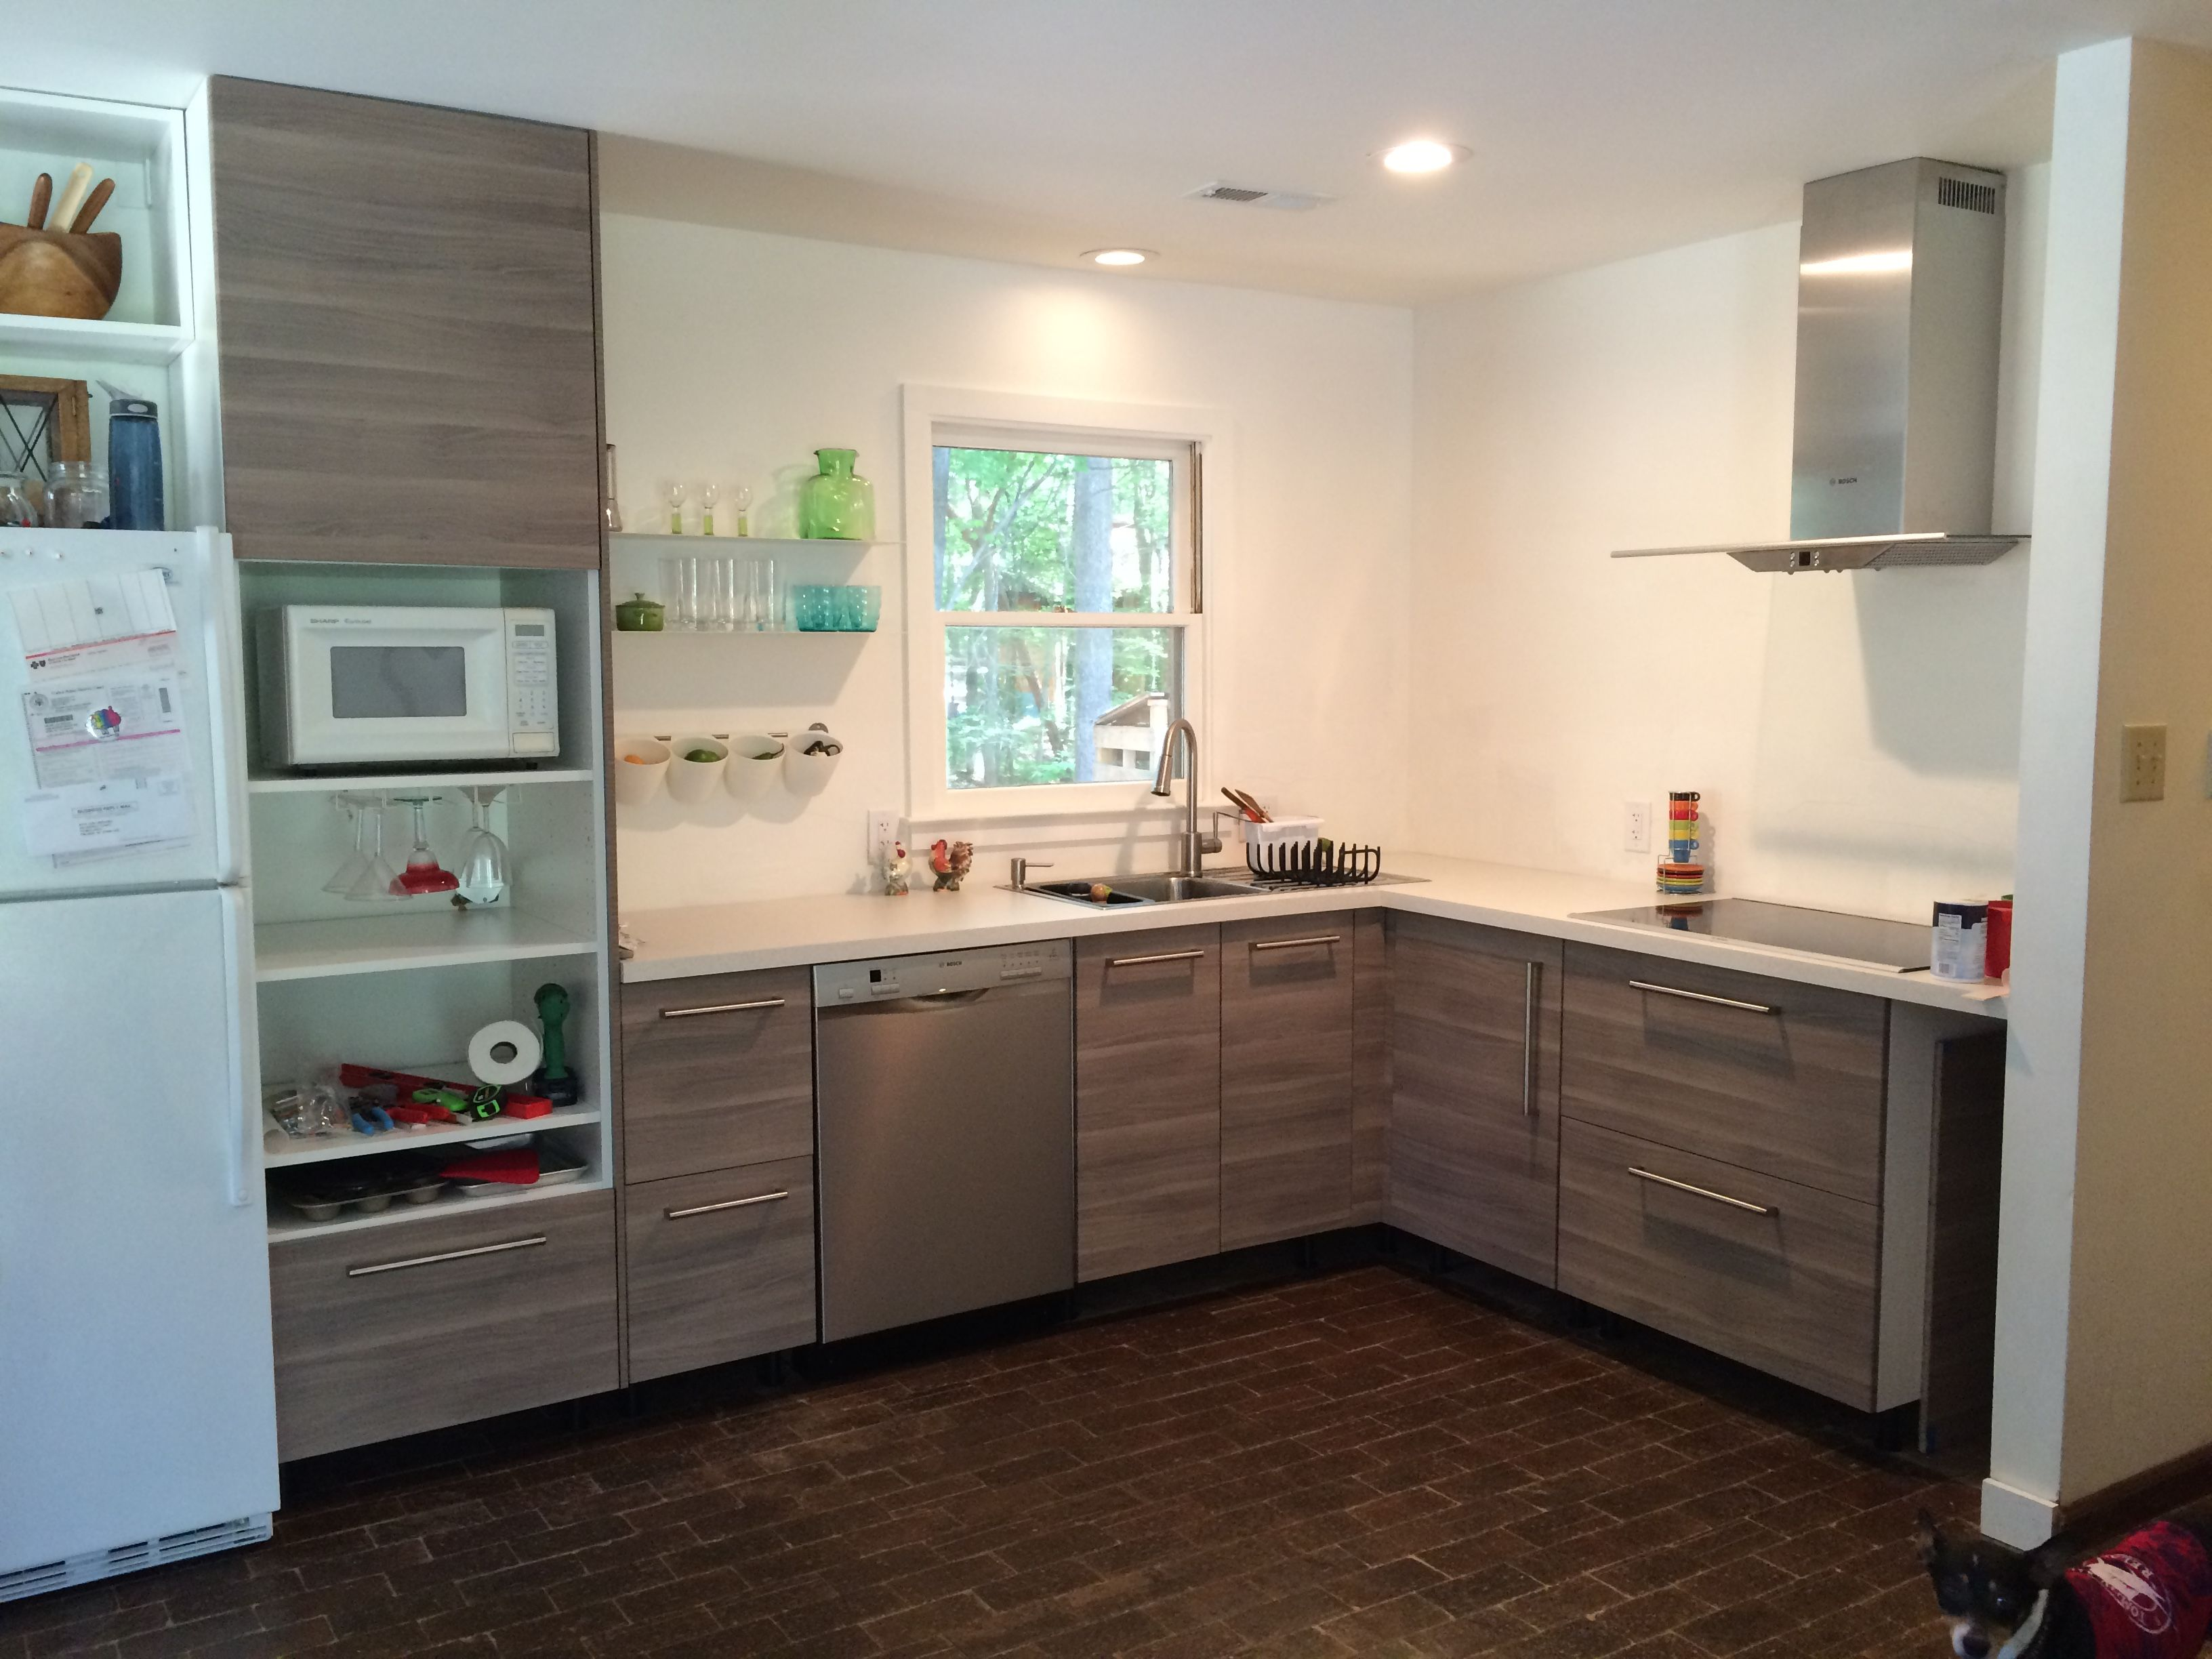 Ikea brokhult kitchen cabinets Kitchen Pinterest